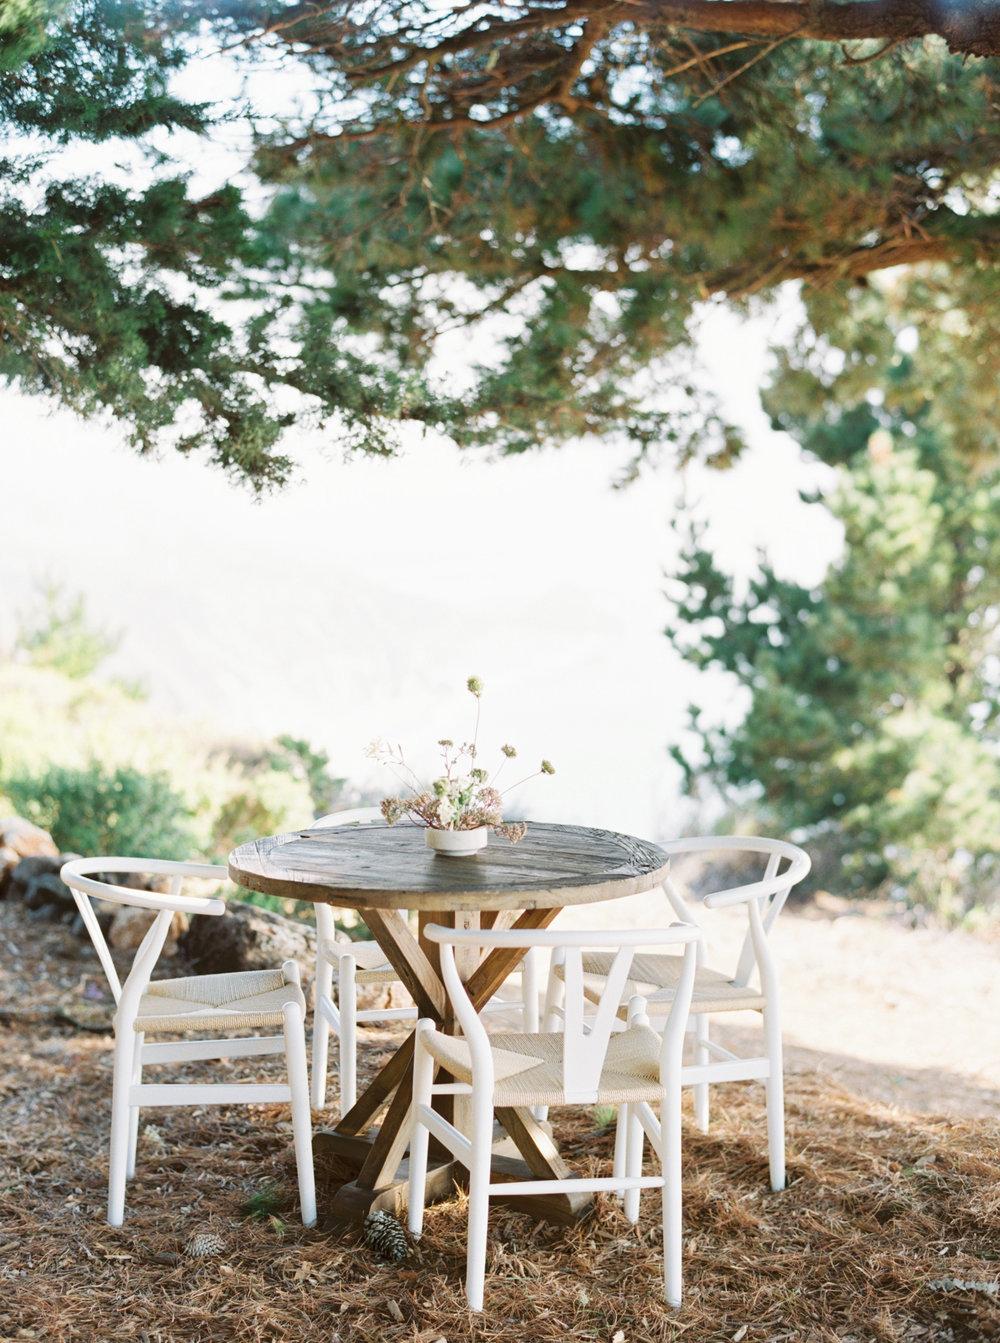 12th-Table-BIG-SUR-WEDDING-Erich-McVey-1